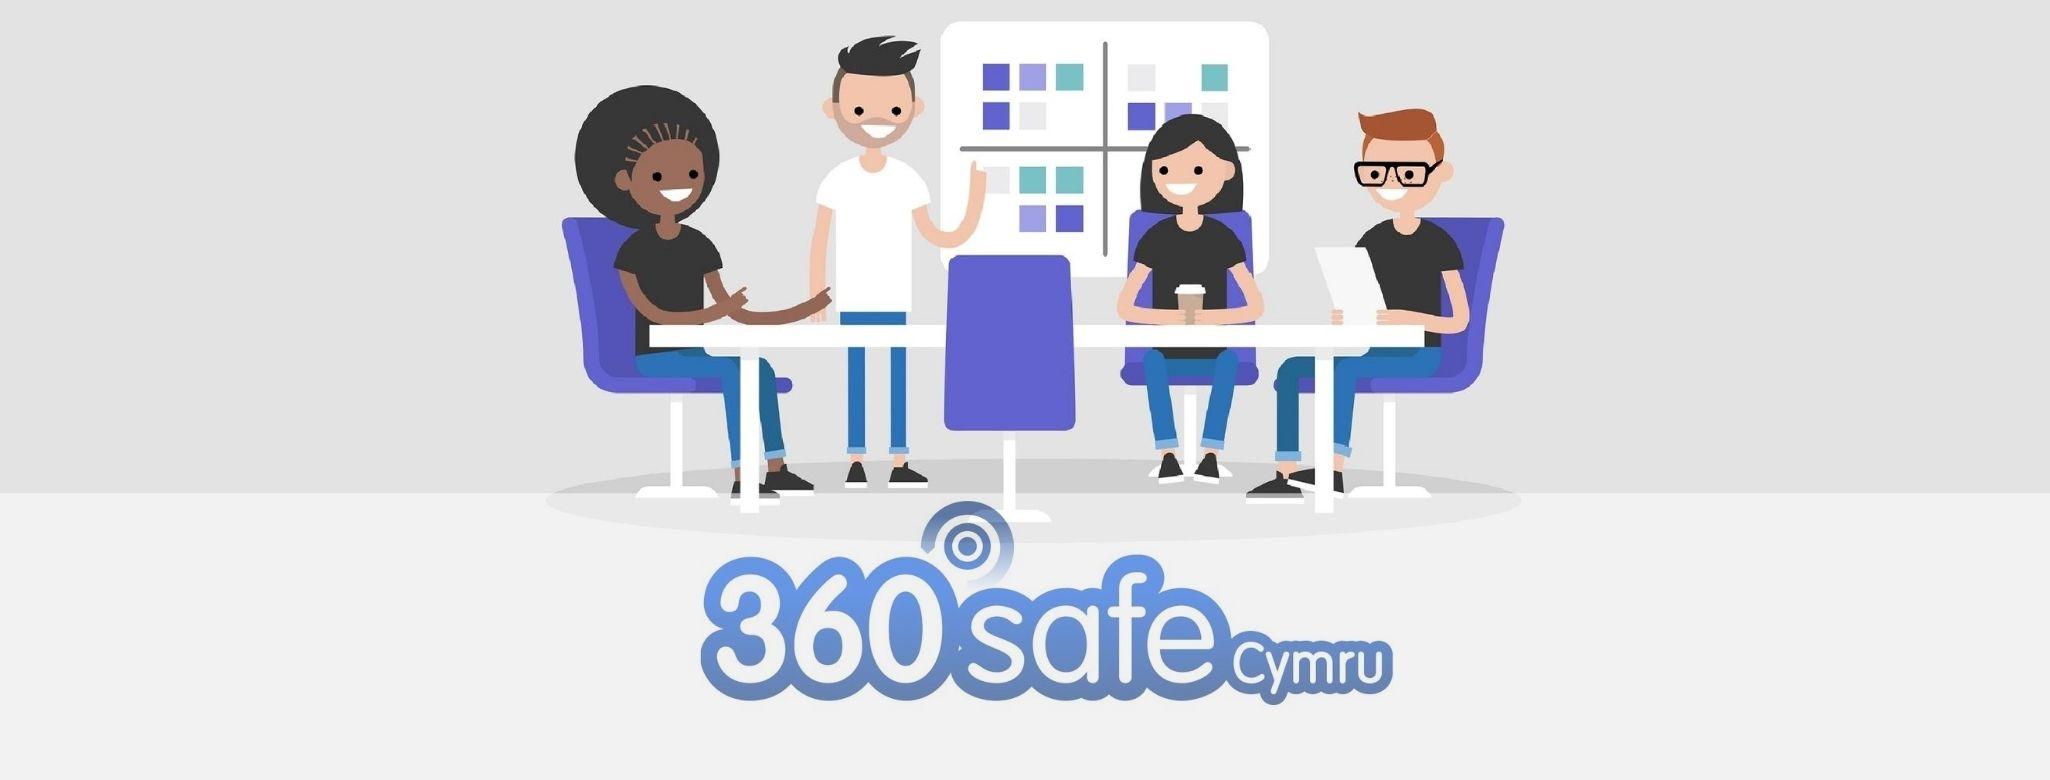 360 safe Cymru